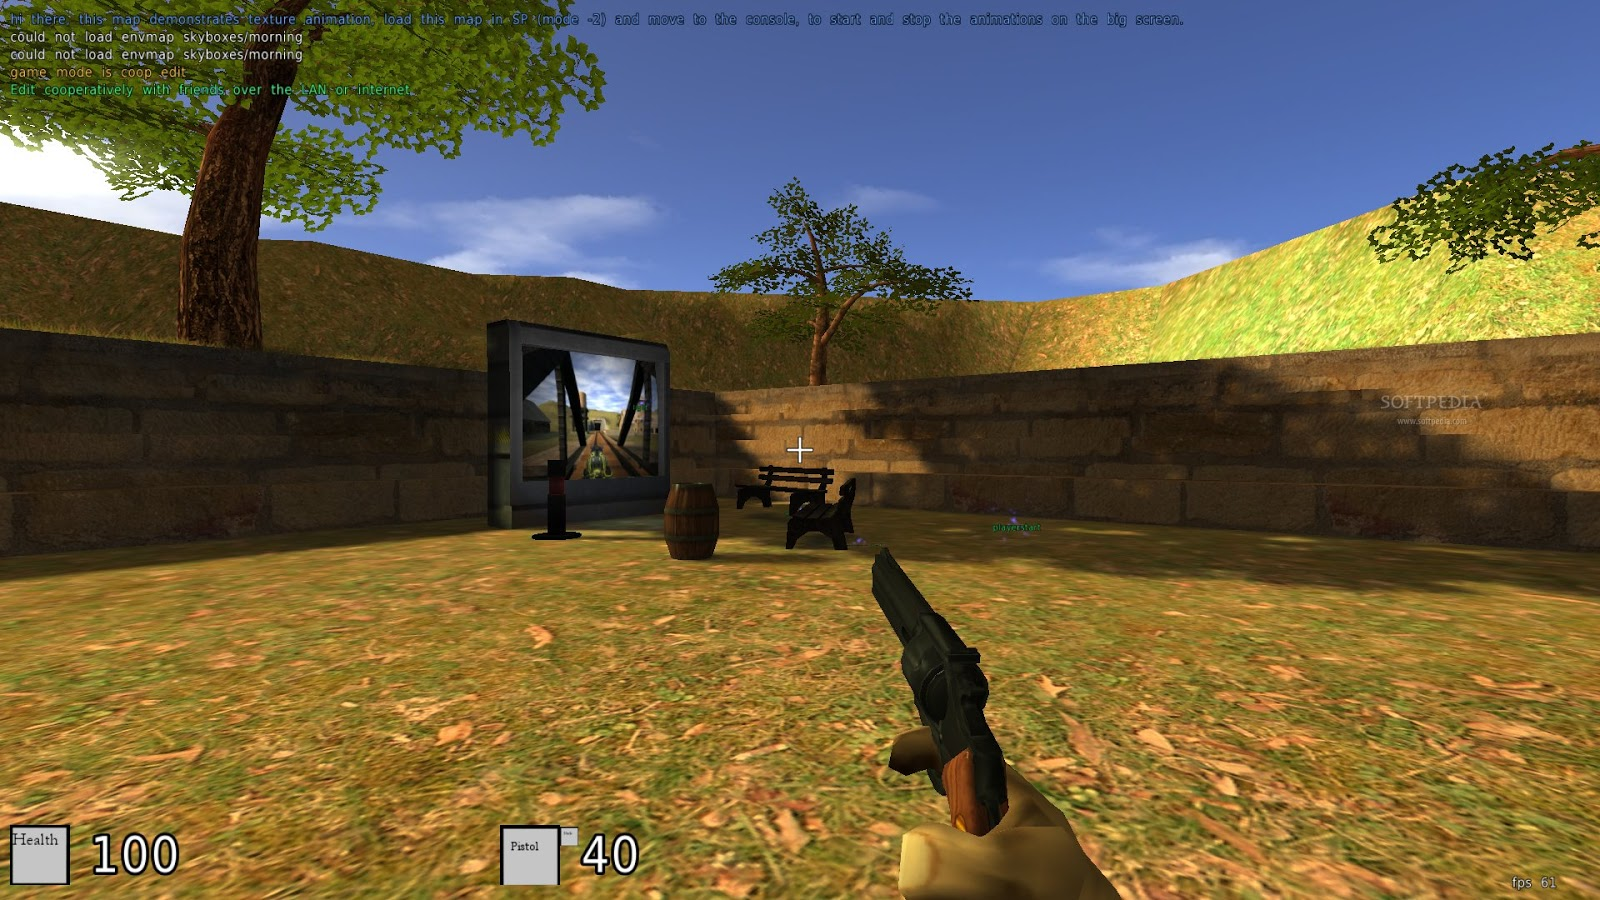 Wallpaper Illusion 3d 3d Gun Image 3d Game Maker